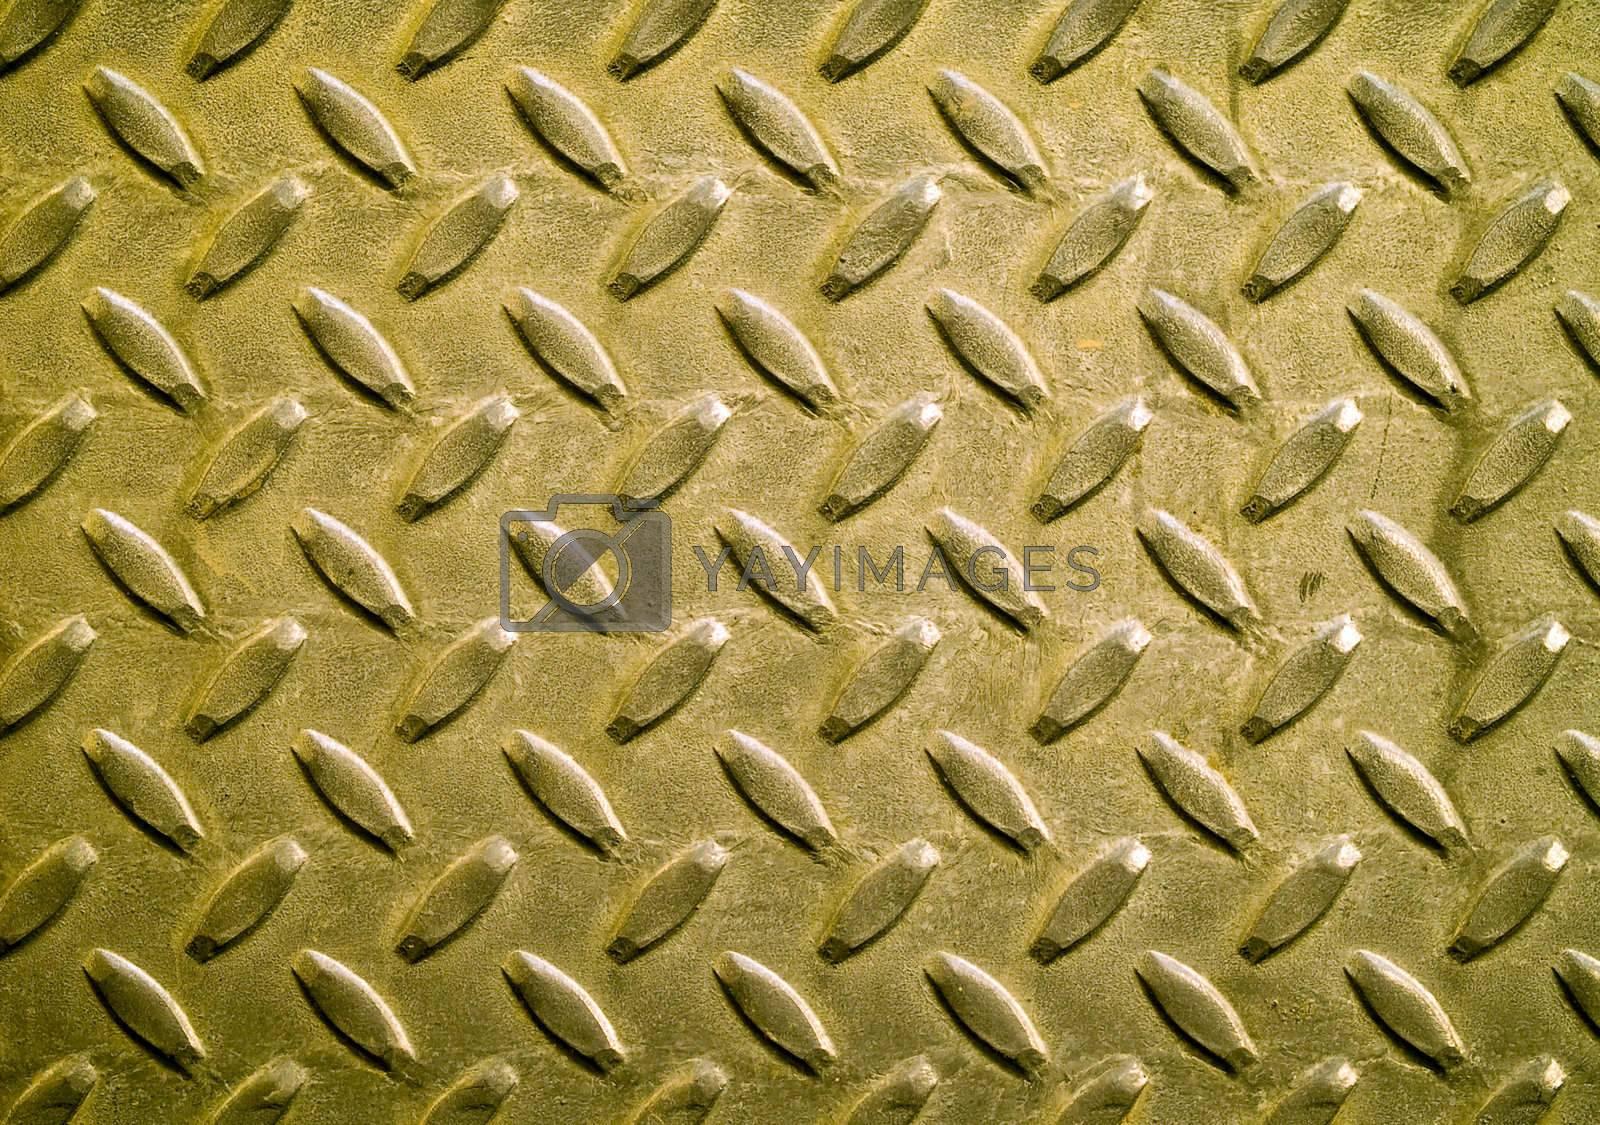 Diamond Metal Background Texture by Frank L Junior